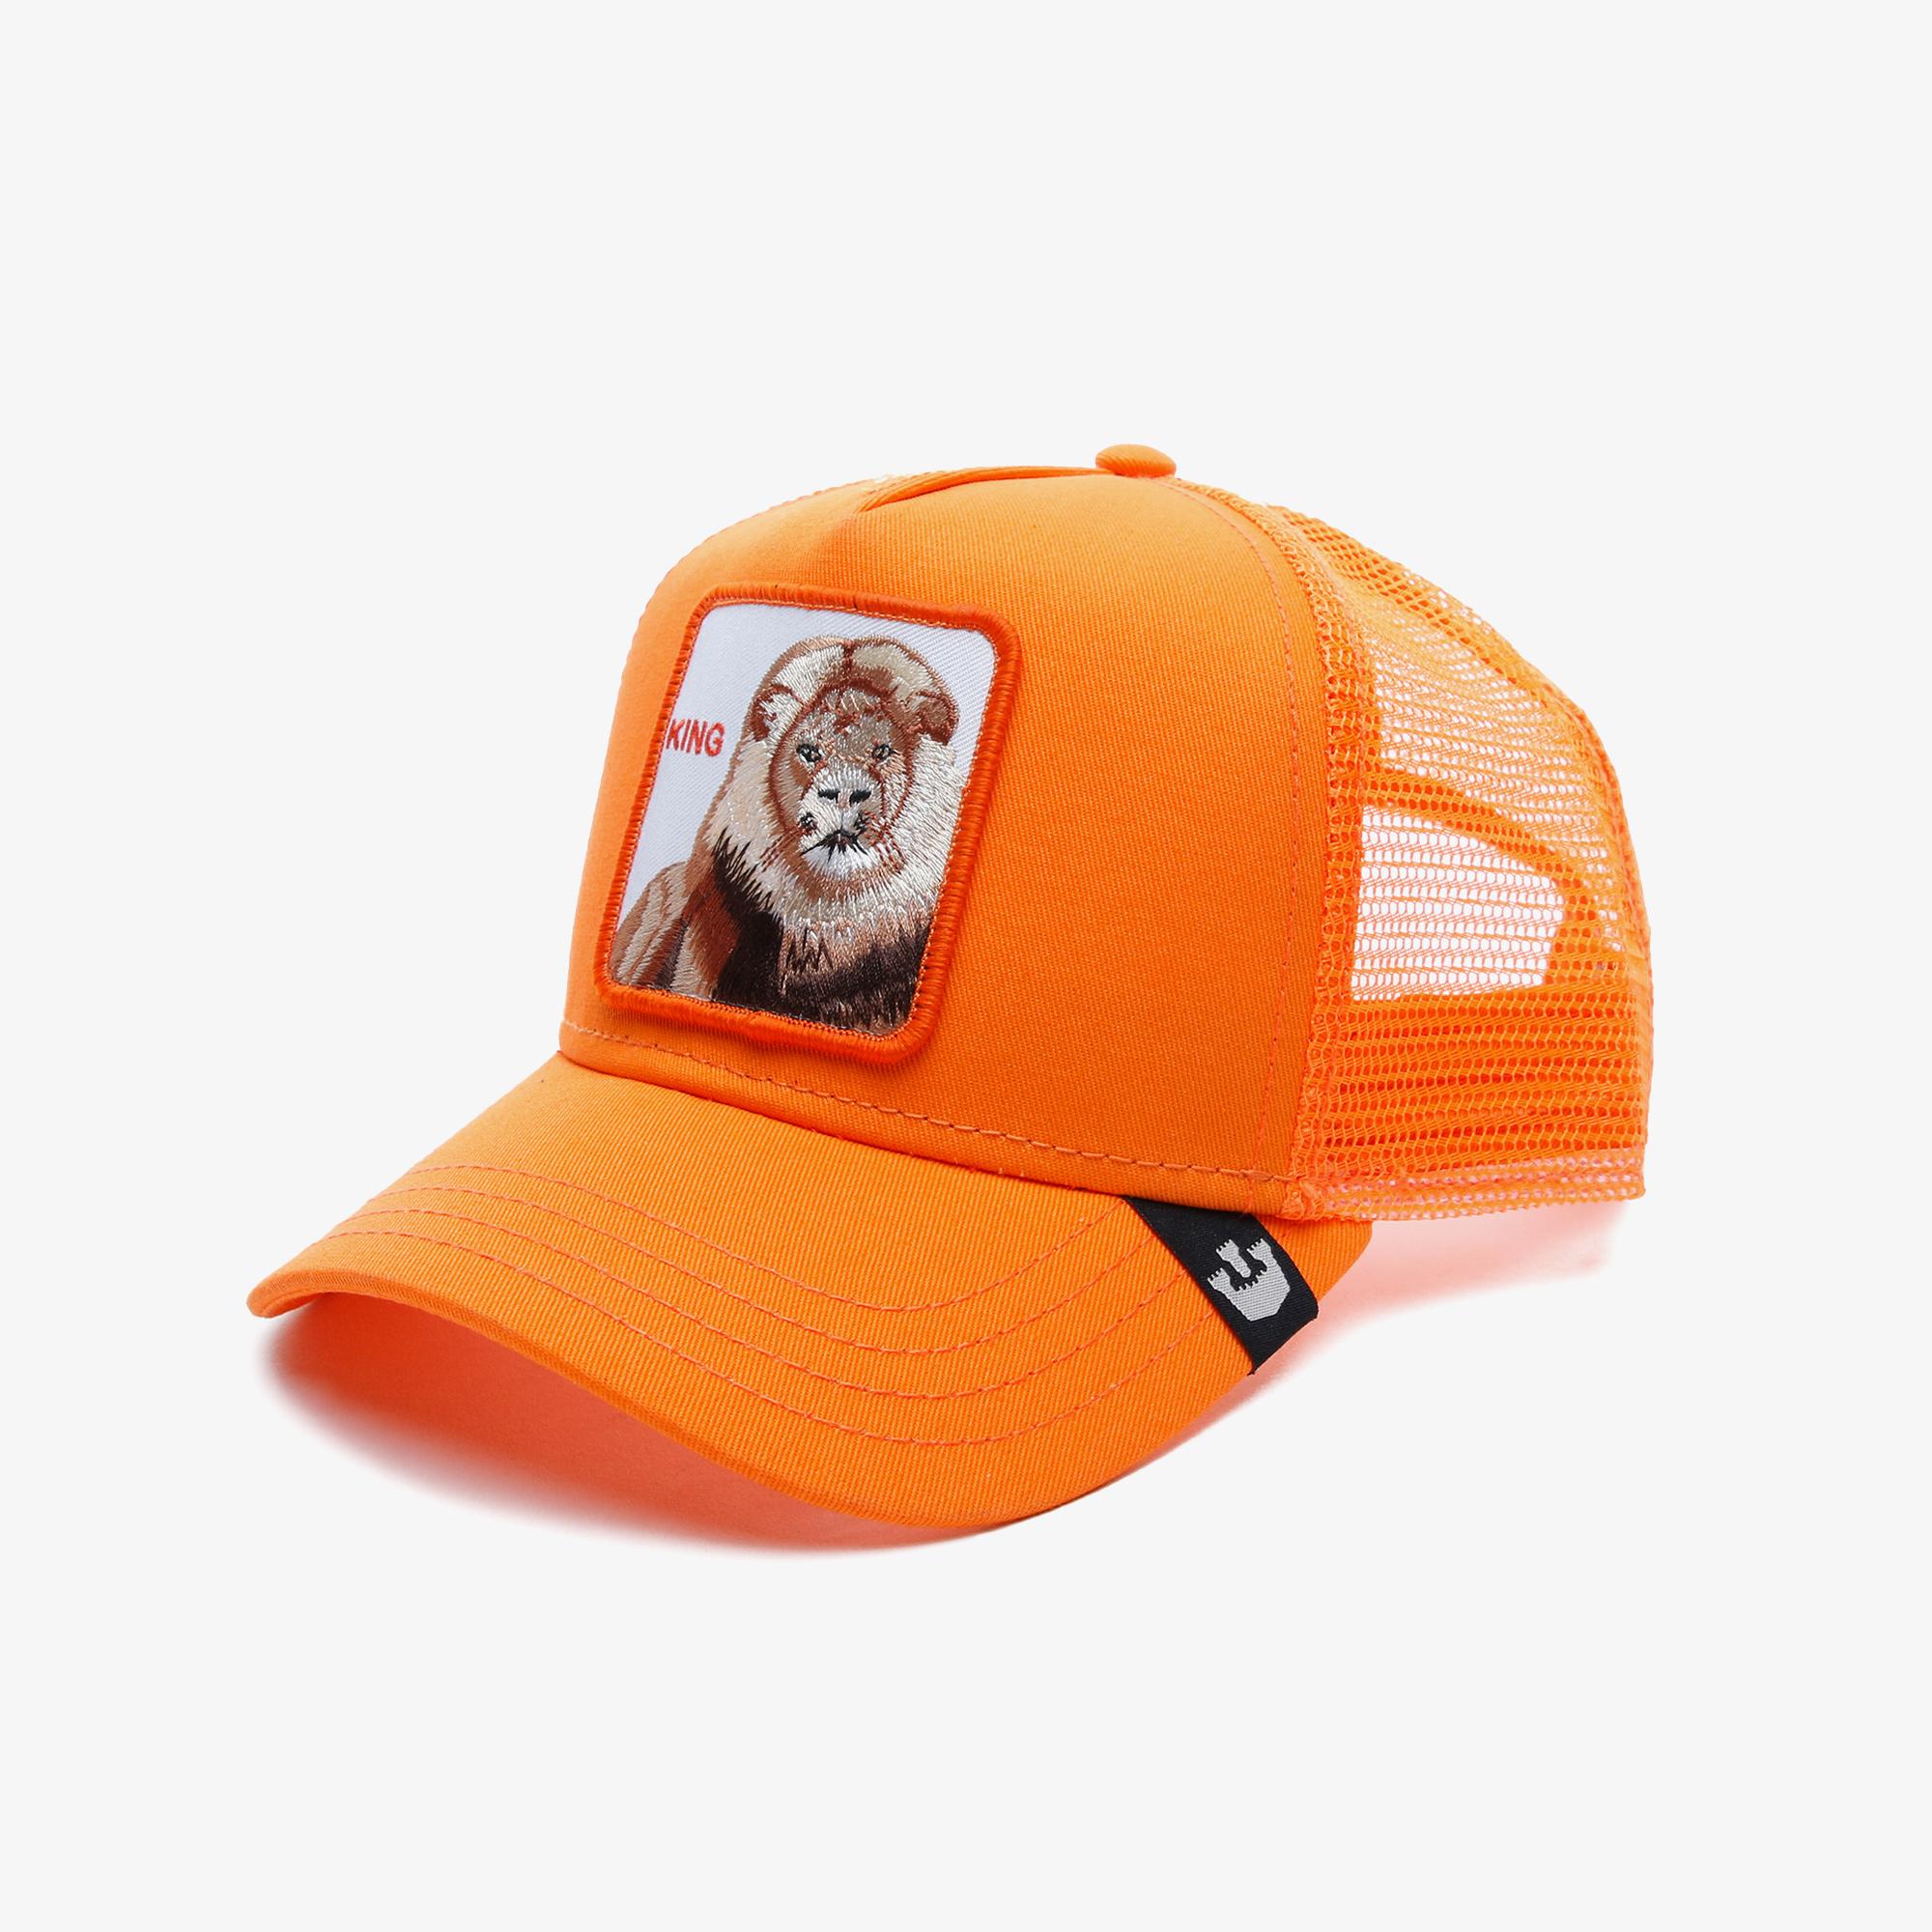 Goorin Bros Strong King Unisex Turuncu Şapka